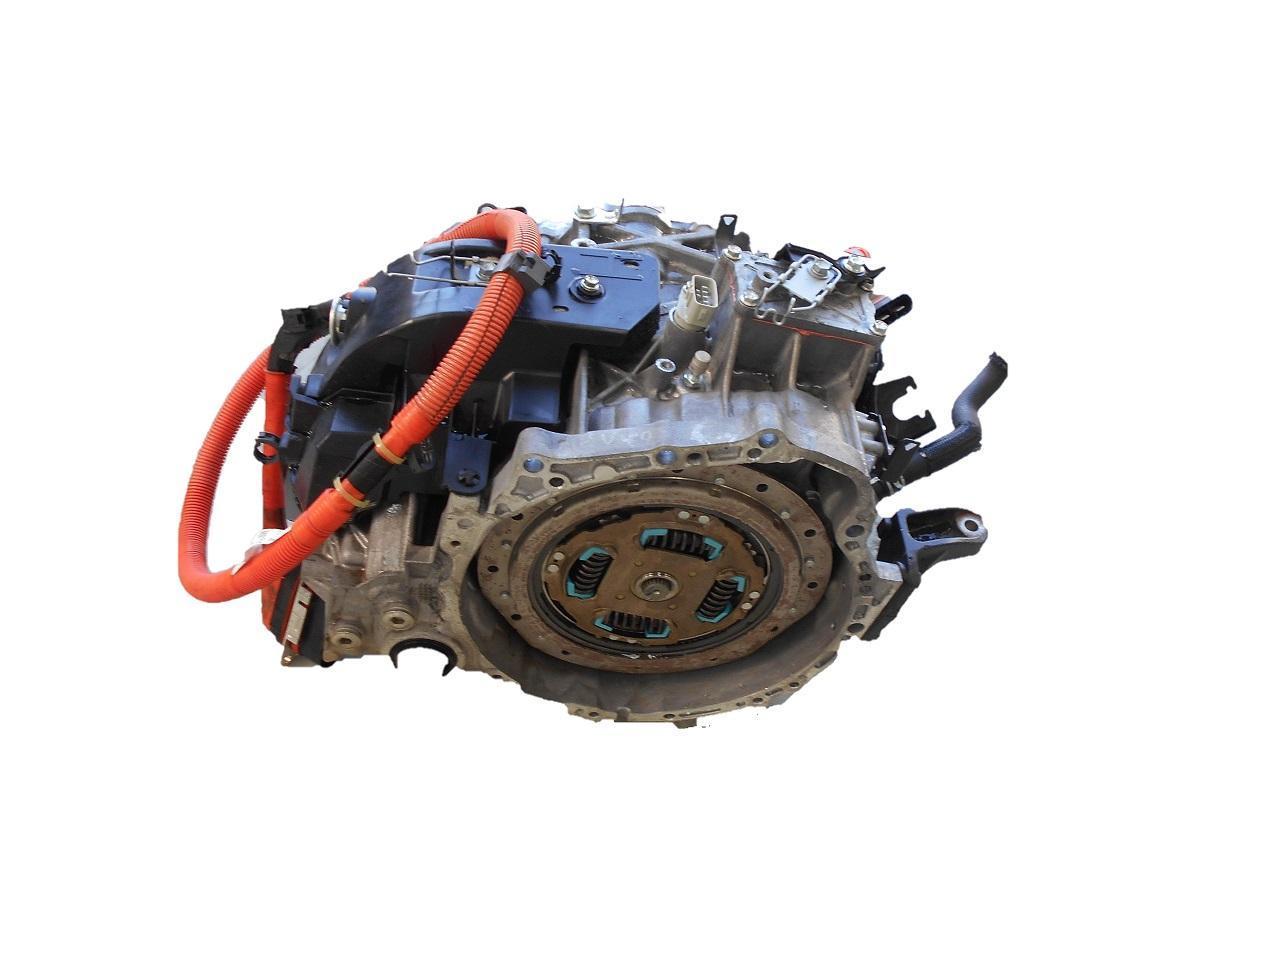 TOYOTA CAMRY, Trans/Gearbox, AUTO, CVT, ELECTRIC HYBRID, AHV40, 12/09-11/11